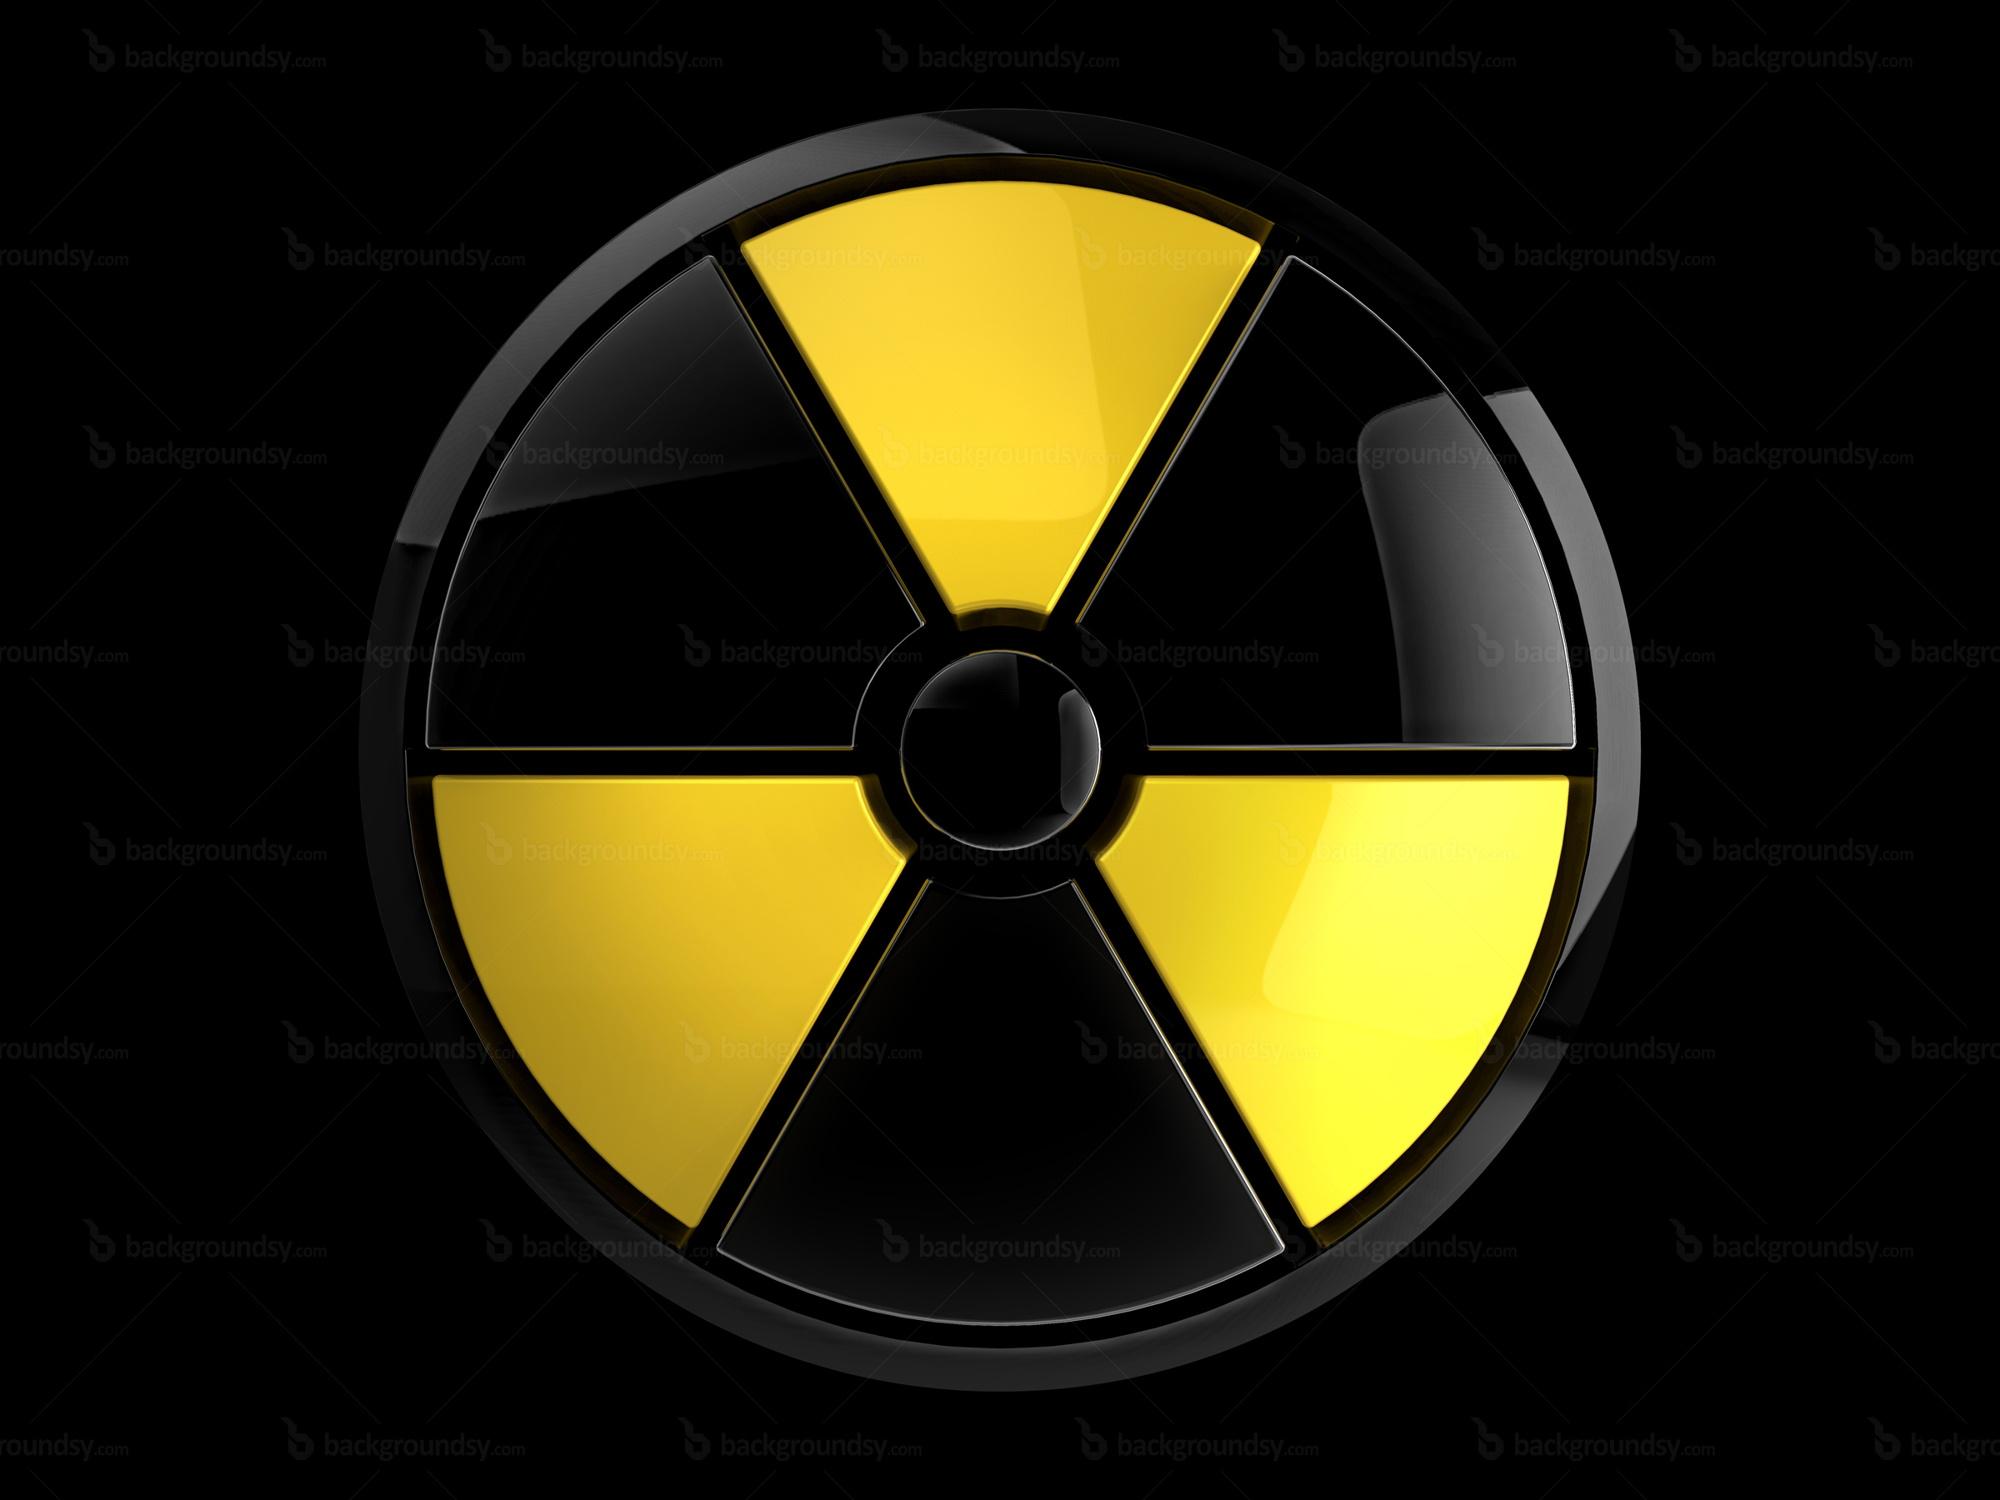 Radiation Warning Signs Symbols